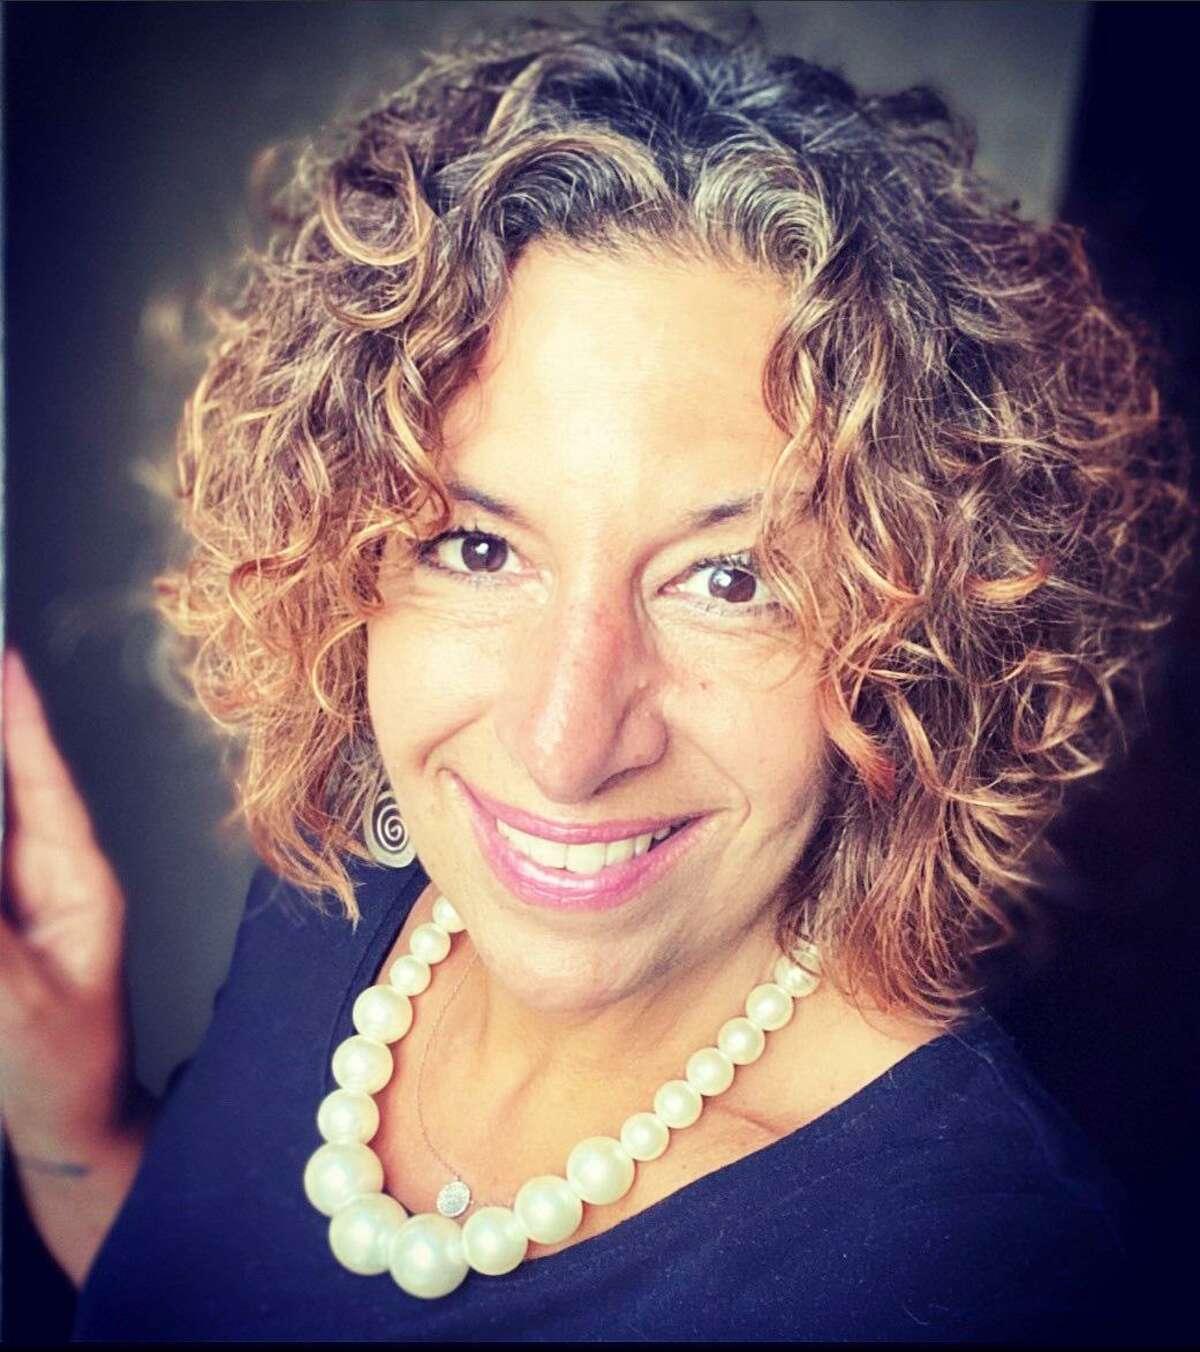 Victoria Iaccarino Burse works in Wesleyan University's development office in Middletown.